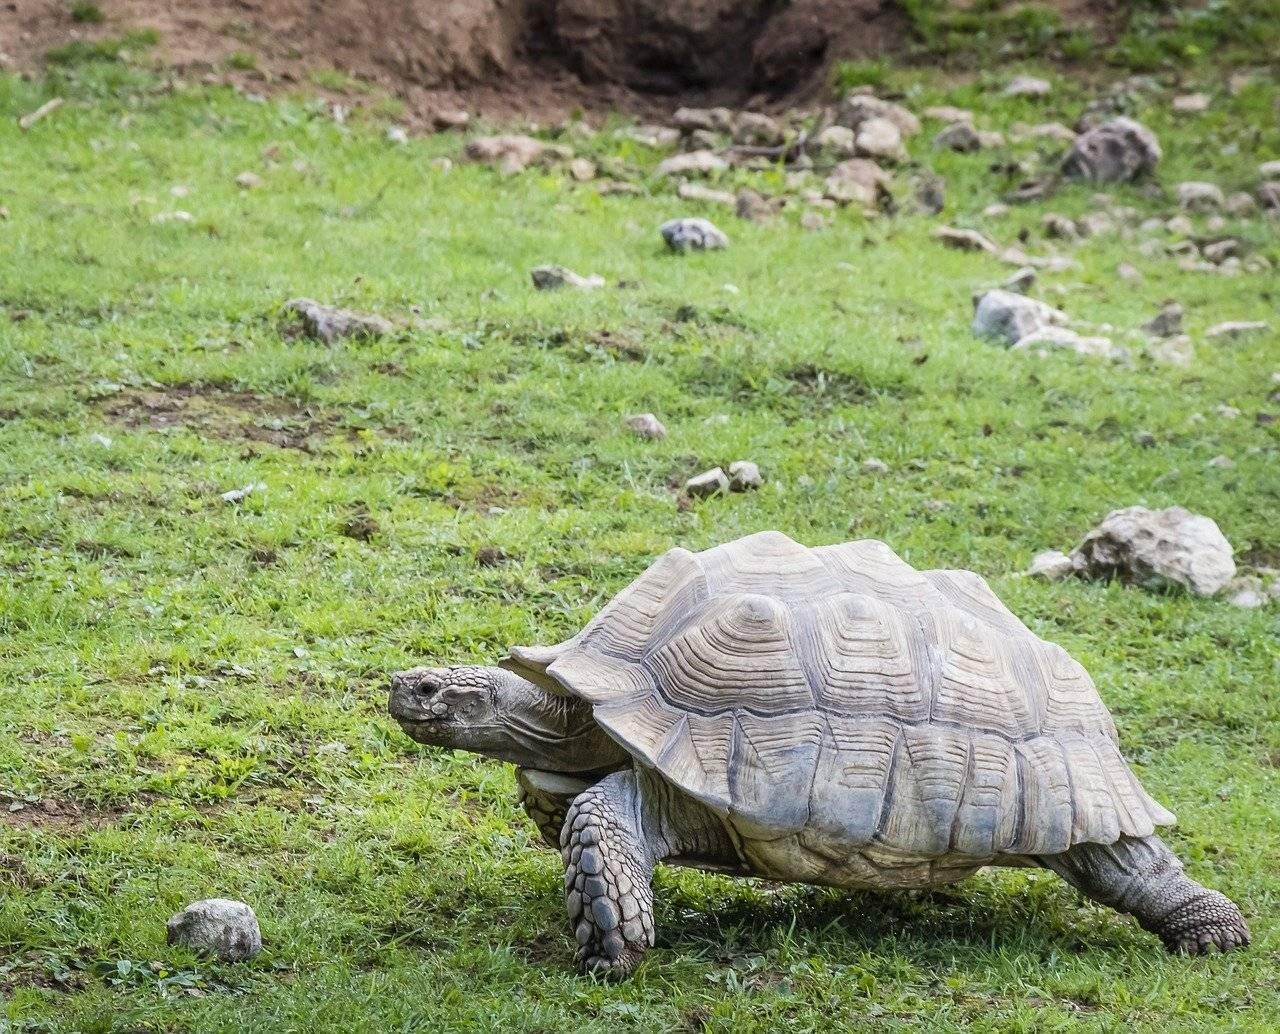 Centrochelys sulcata (шпороносная черепаха) - черепахи.ру - все о черепахах и для черепах